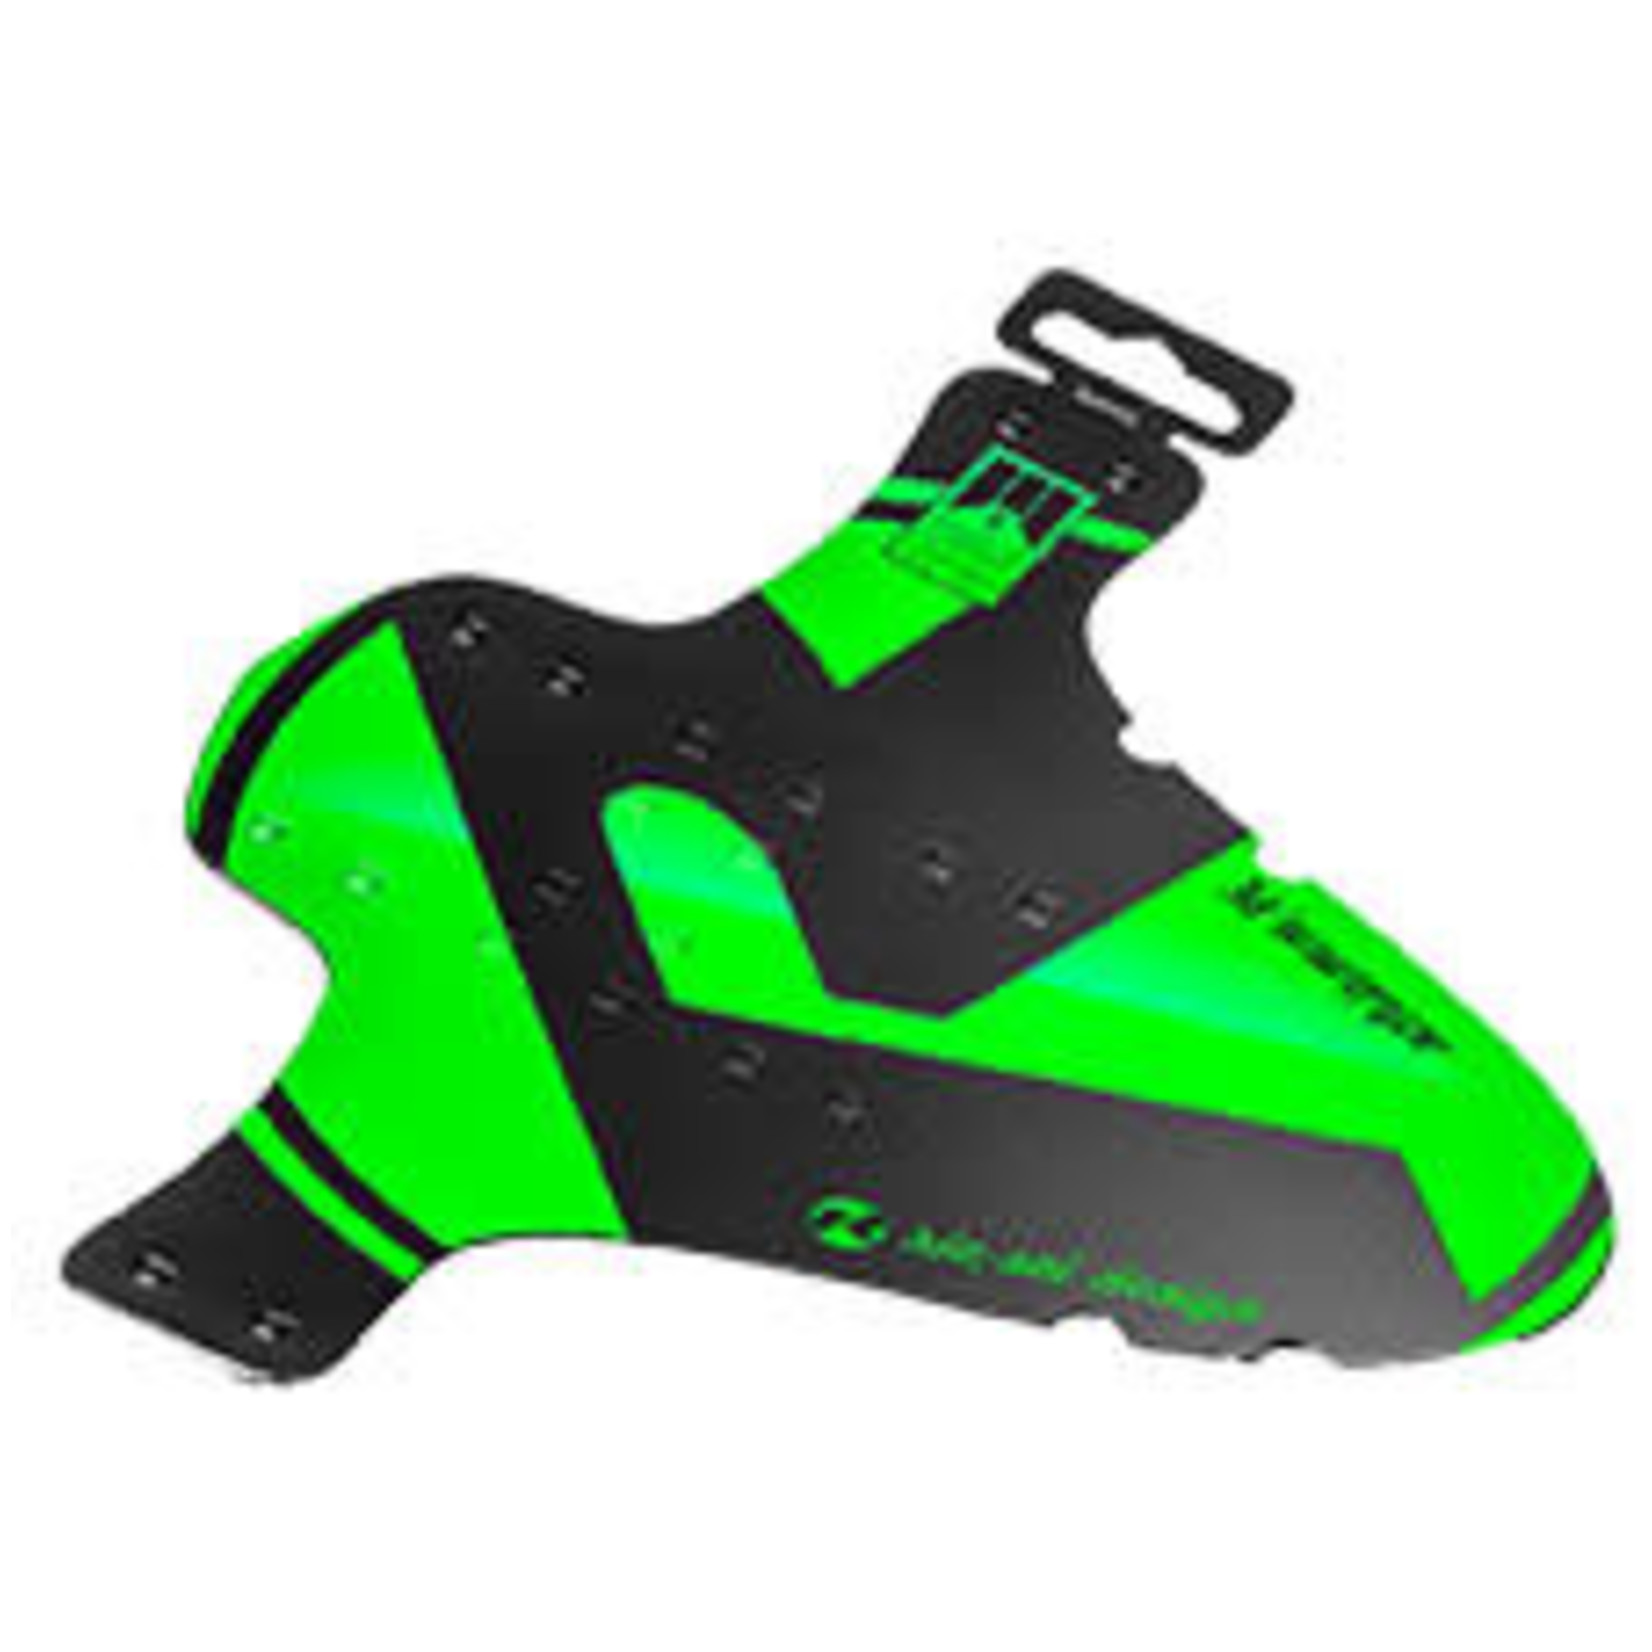 Rie Sel Design Schutzbleche Vorne a Fascette Mudguard - verde